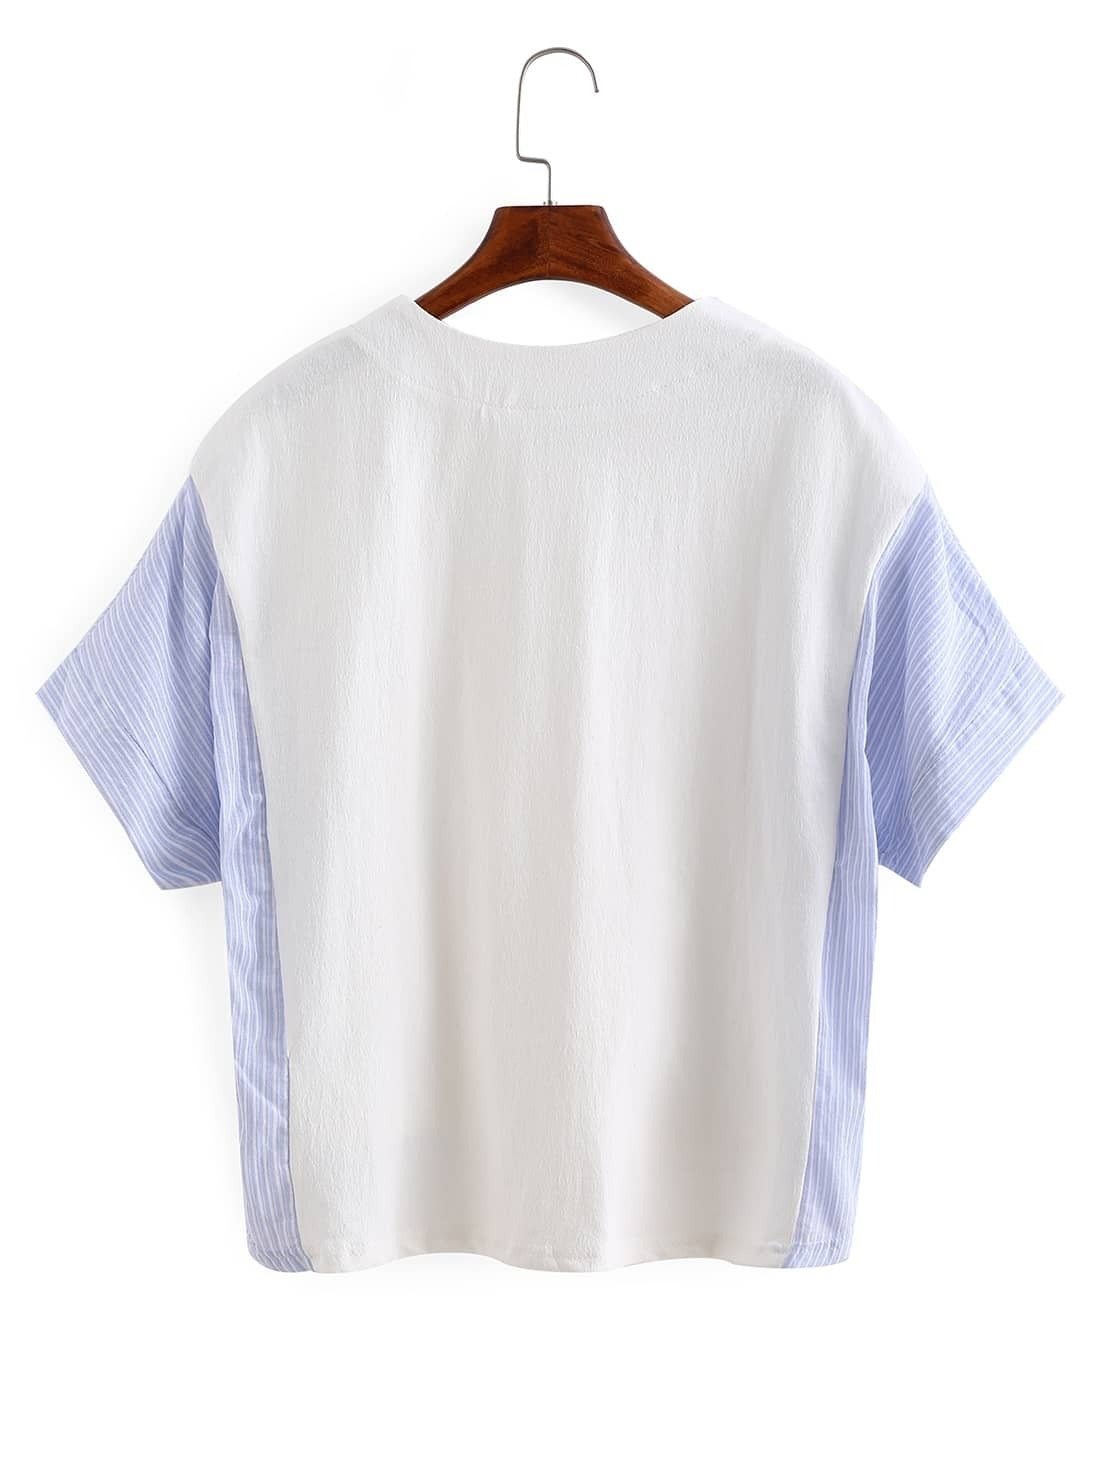 Contrast Vertical Striped High-Low T-shirt -SheIn(Sheinside)